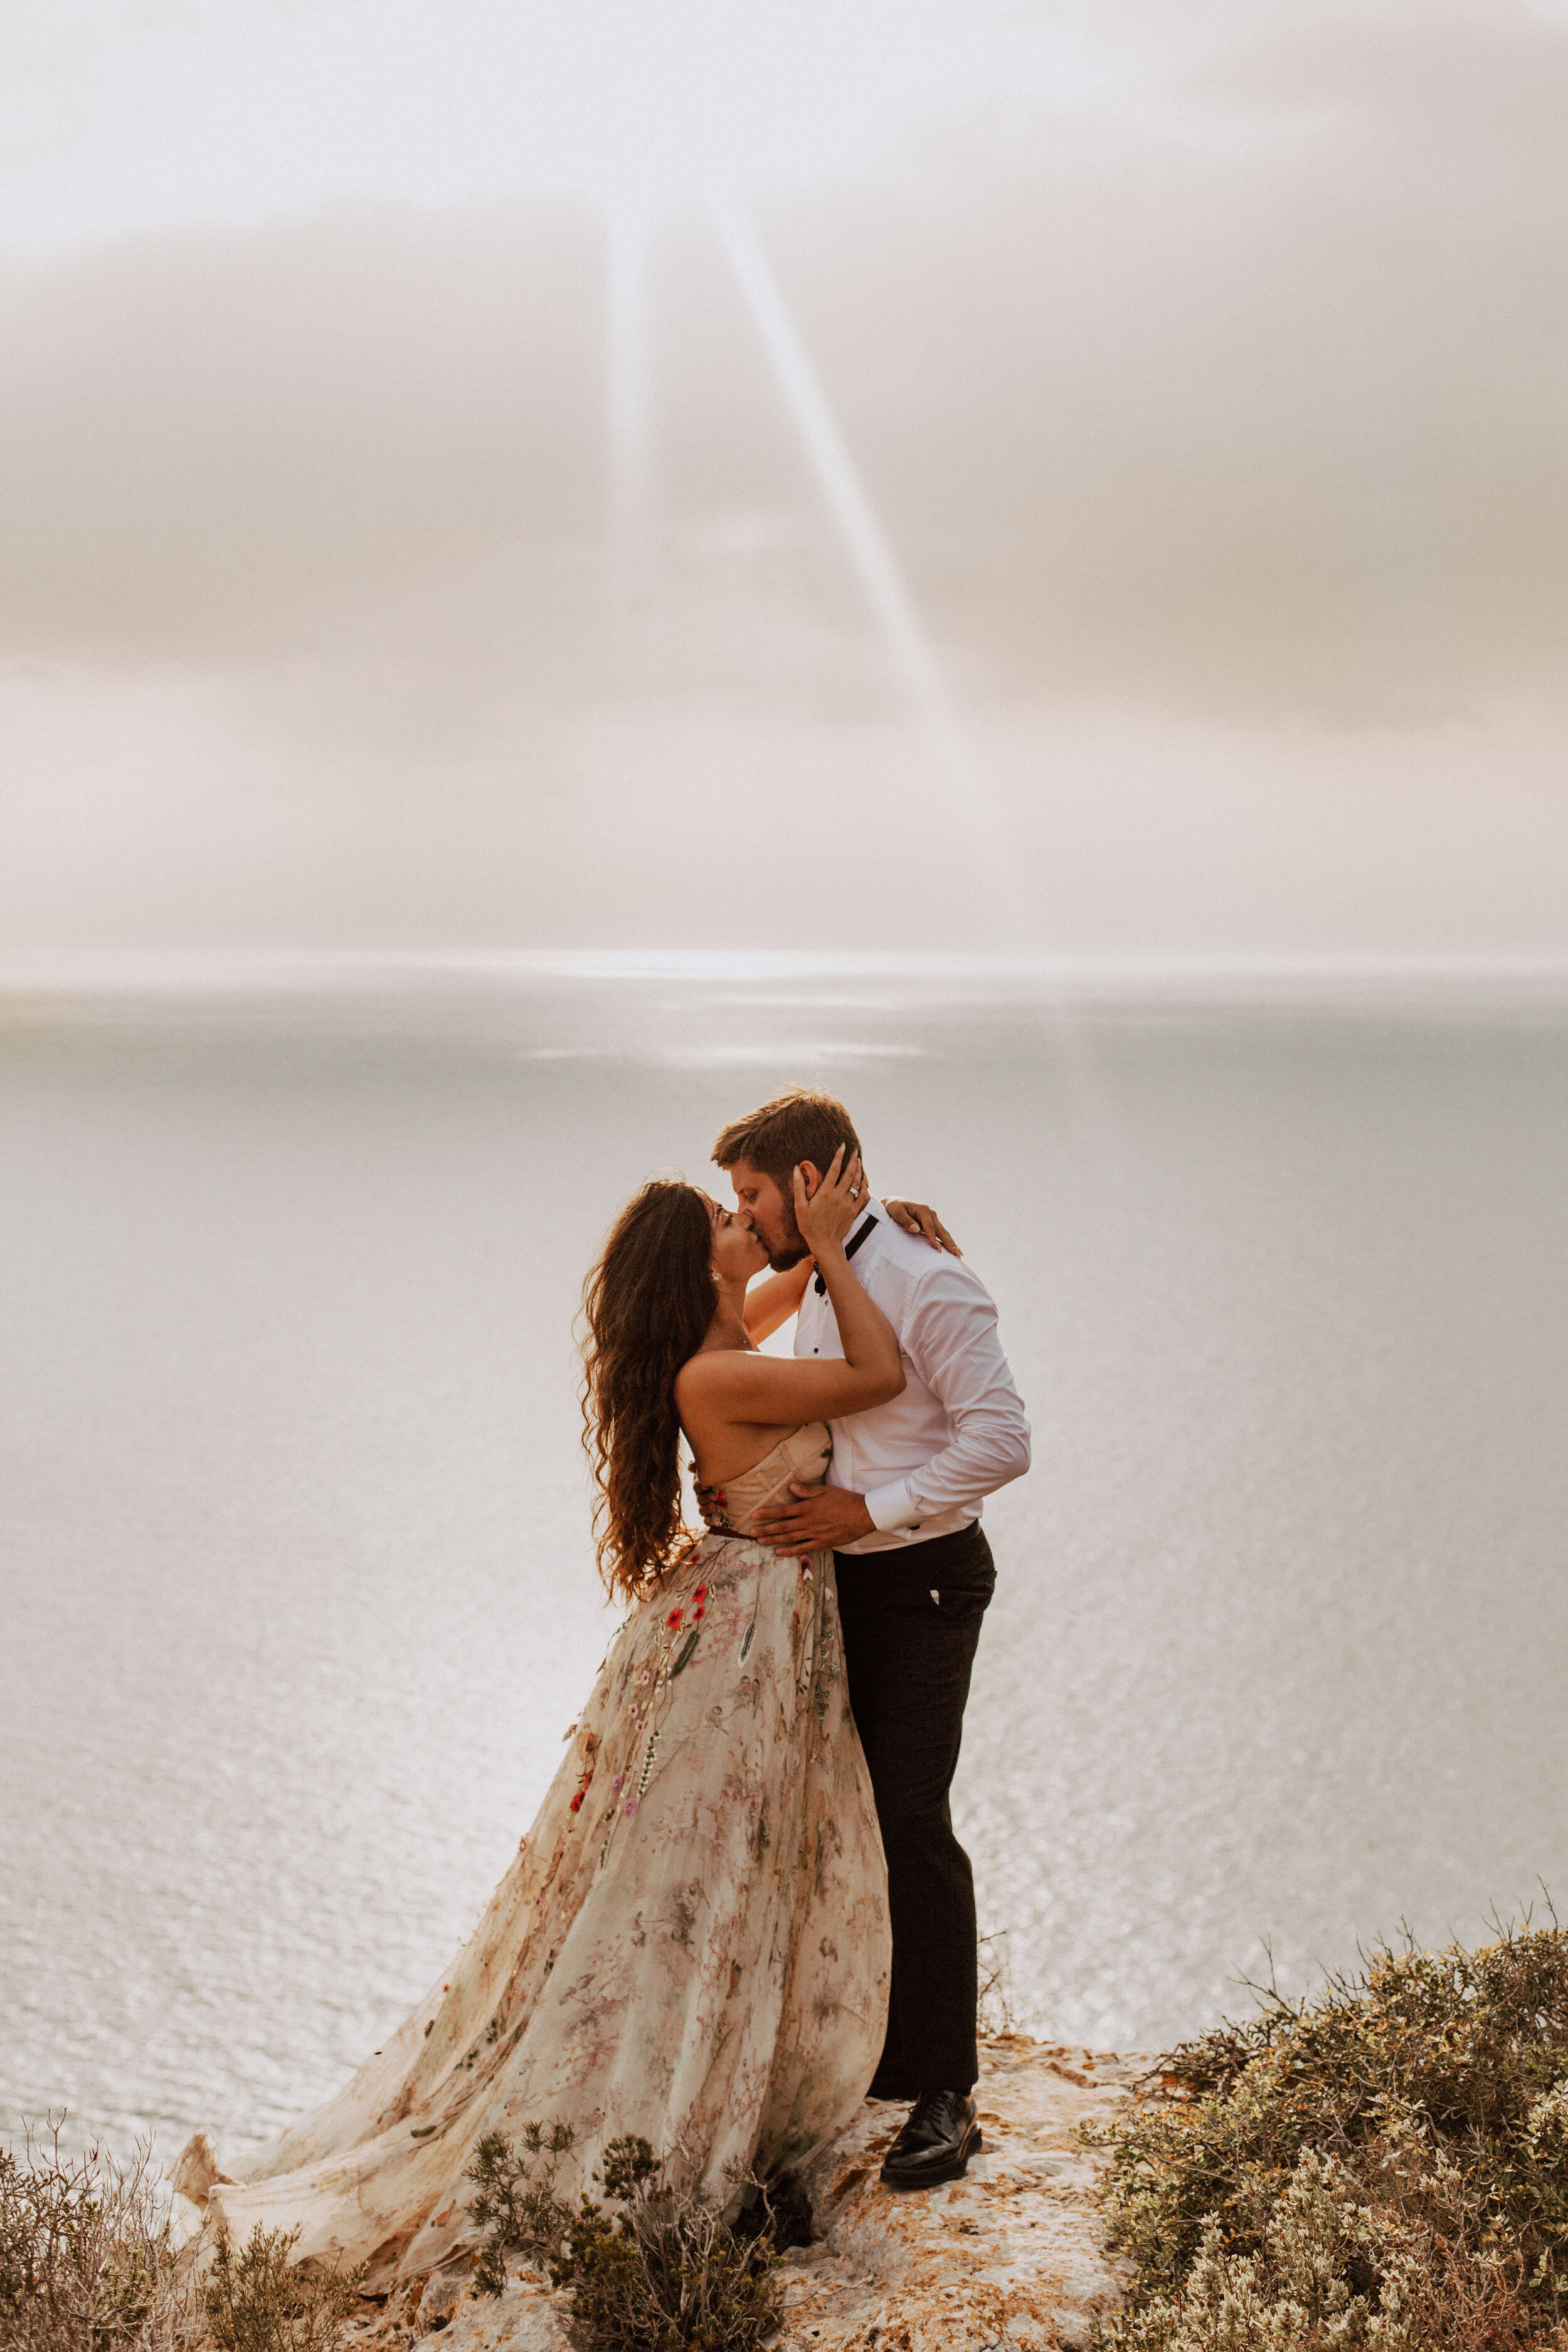 Wedding Photographer Photo Billie Media Mallorca Shoot Couples Shoot Engagement (1 of 1)-2.jpg